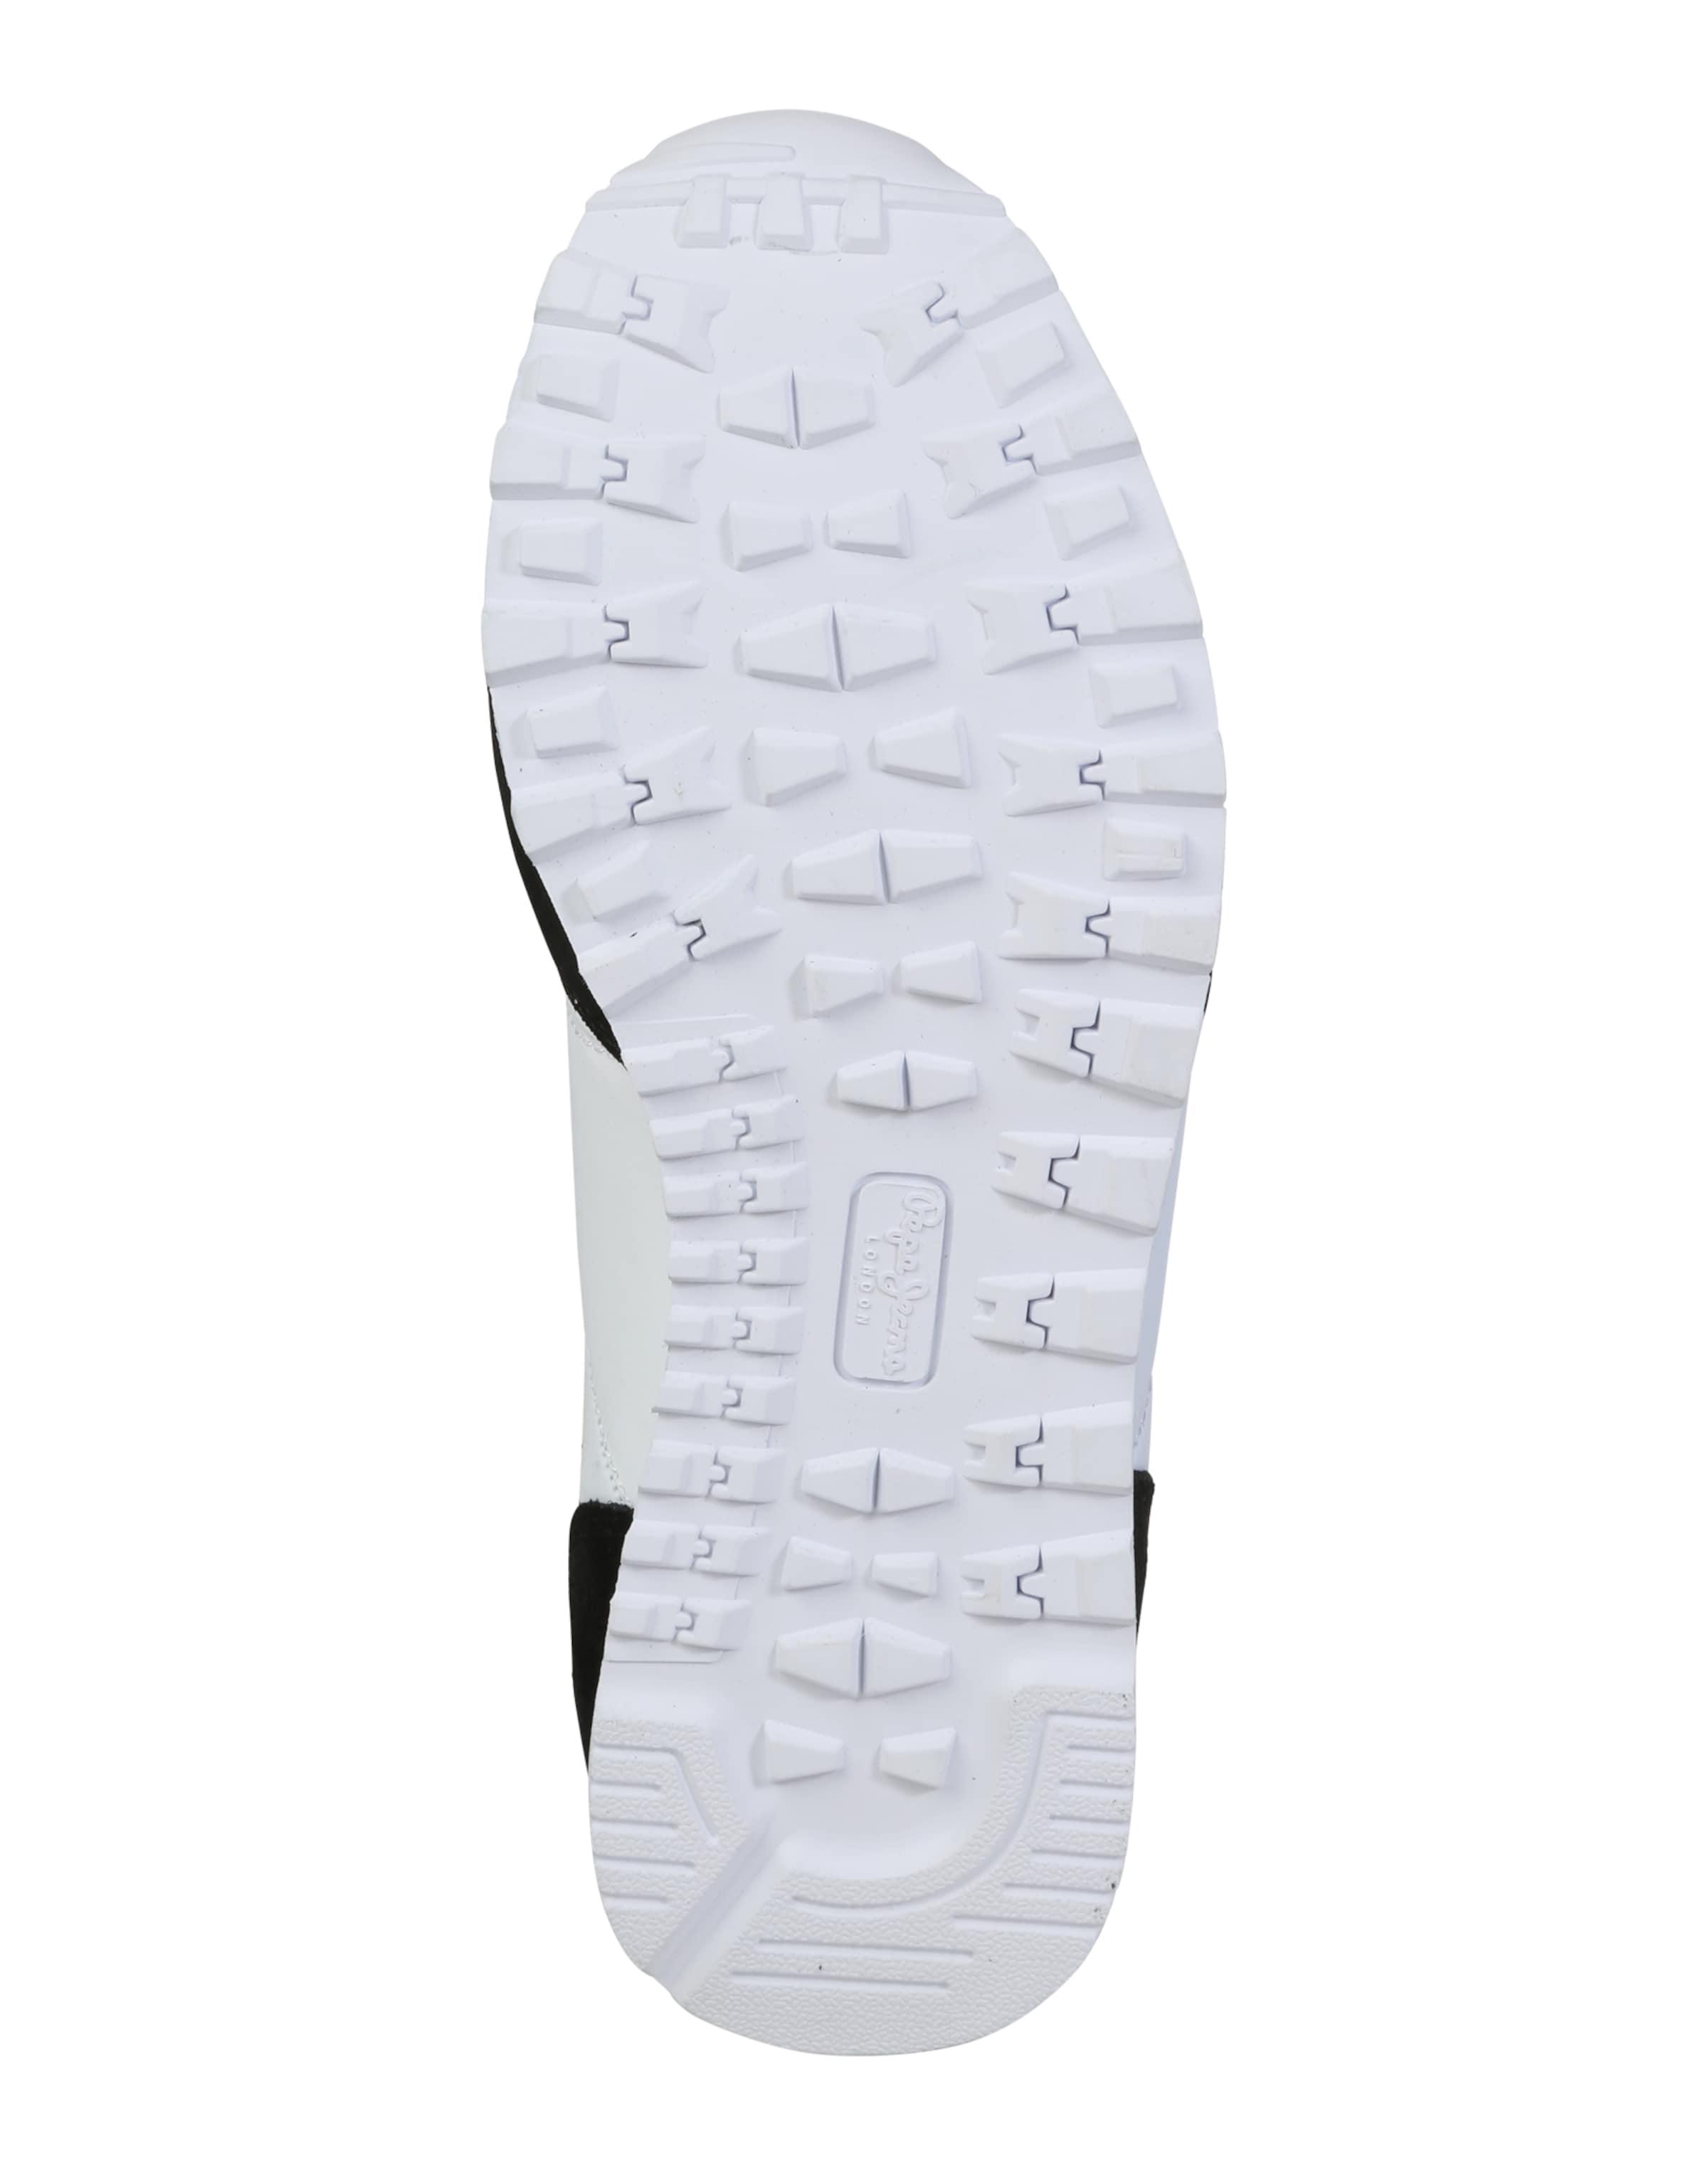 Pepe Jeans Sneaker Low 'Verona' Günstig Kaufen Finish dz5R6